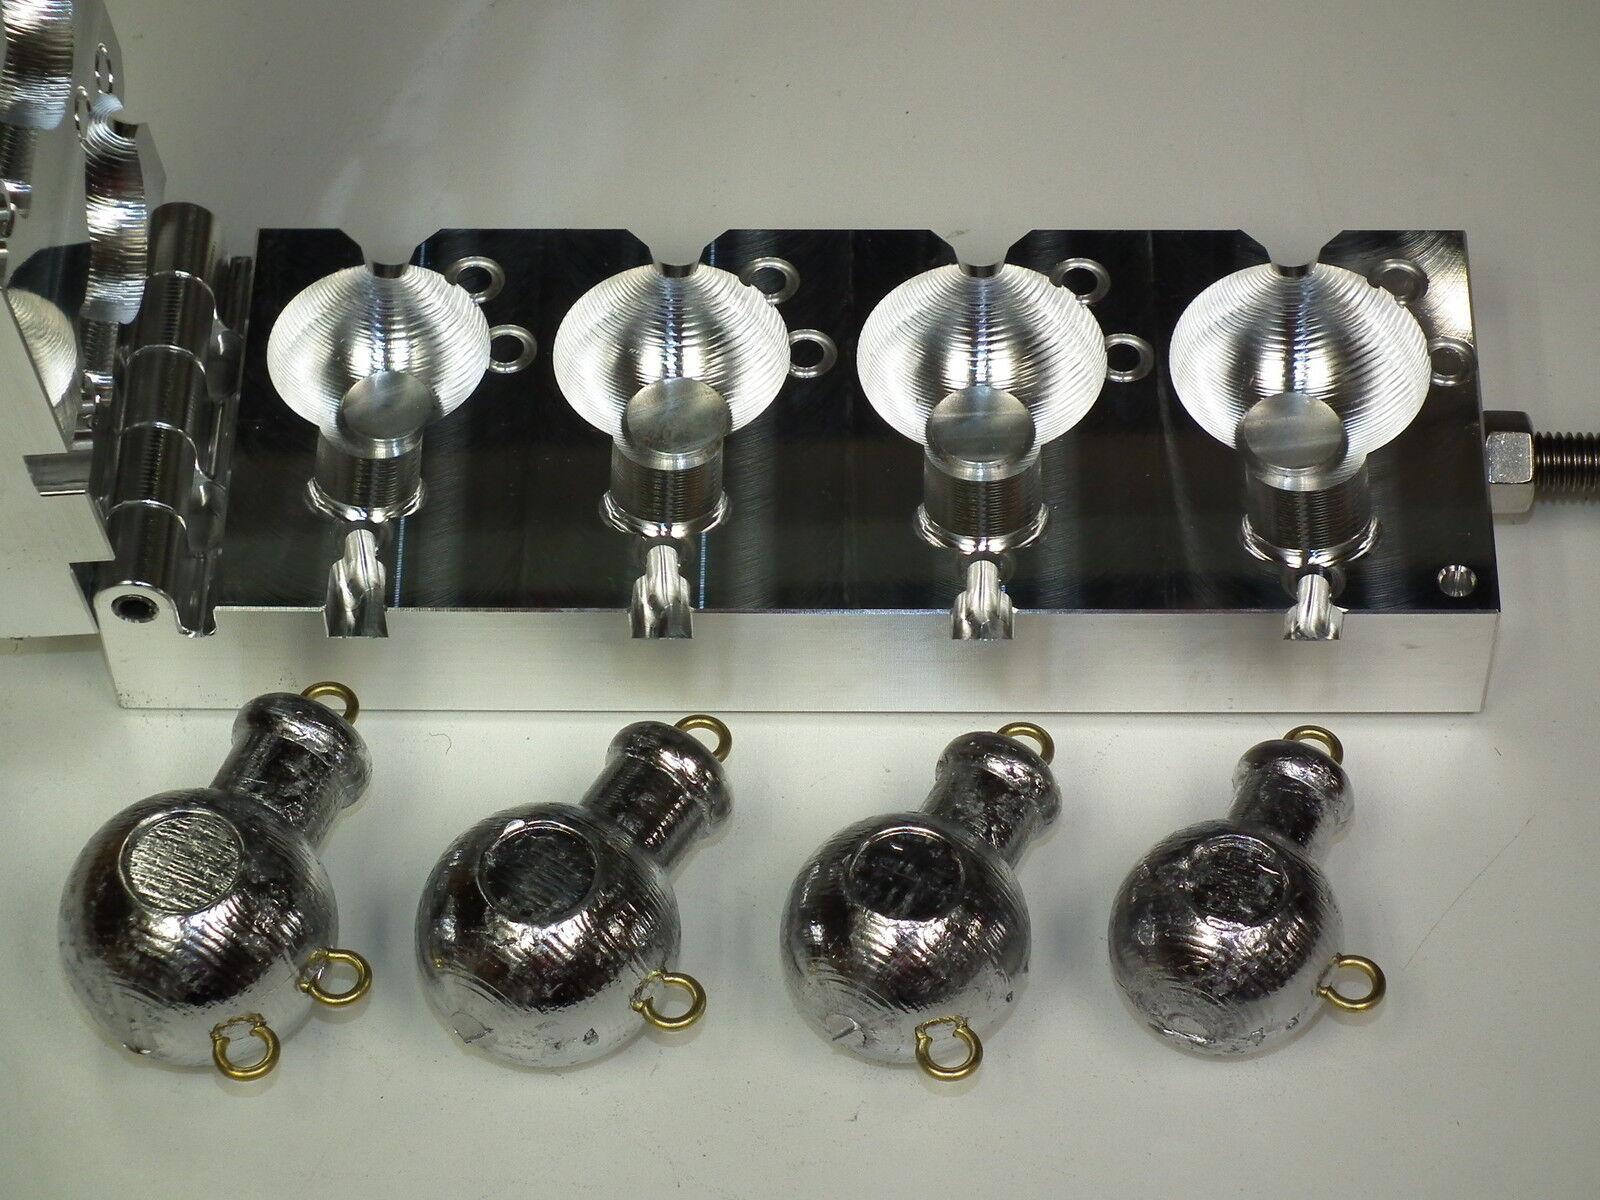 Saltwater Cbal Mojo mold 10, 12, 14, 16oz CNC Aluminum